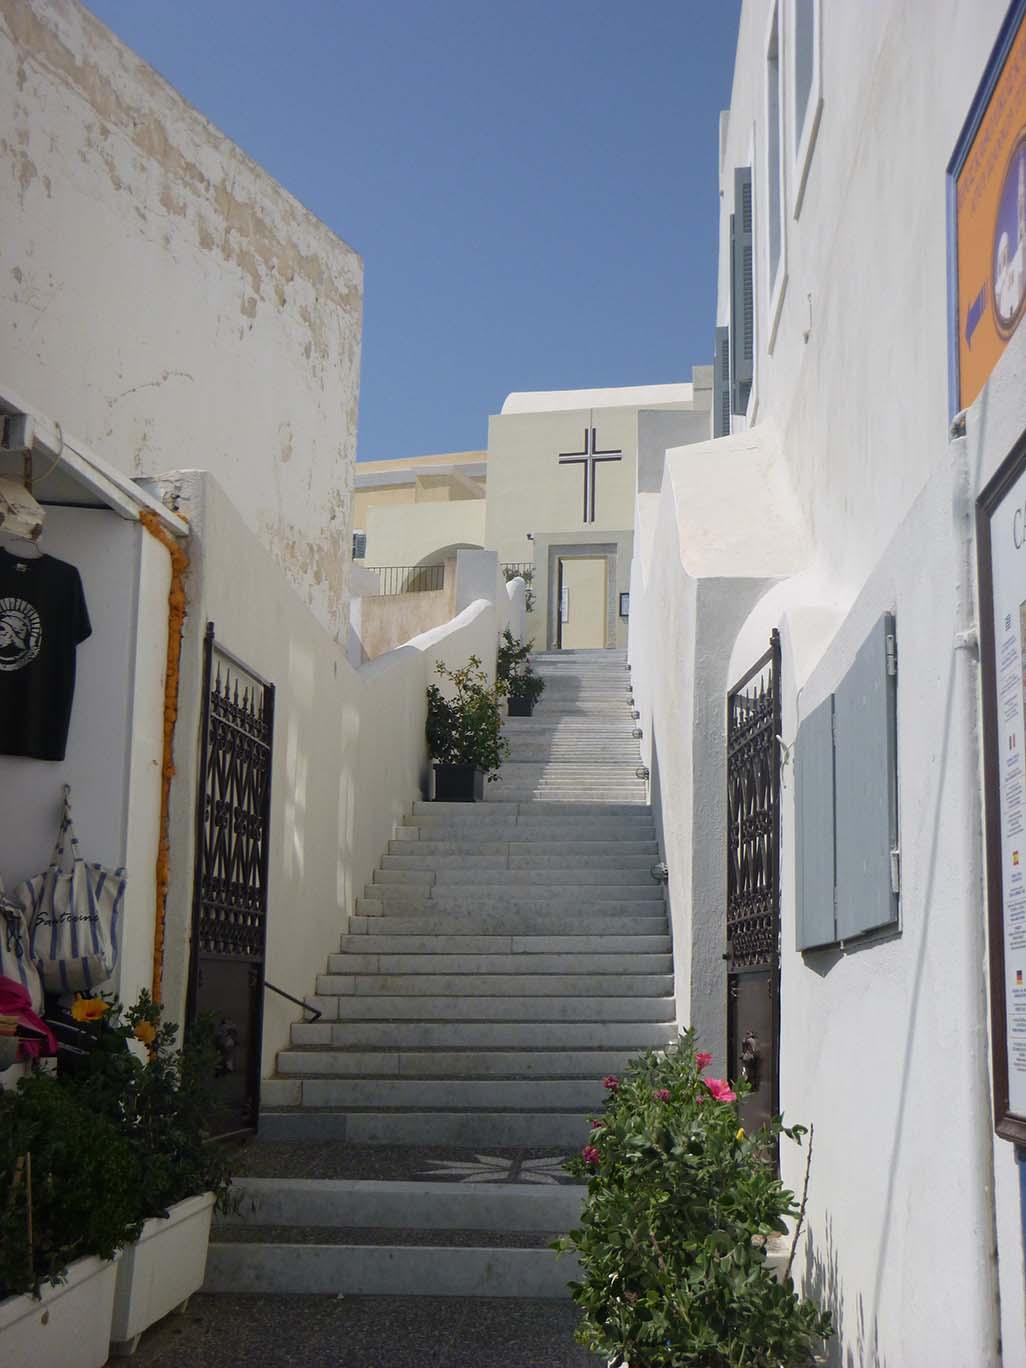 Santorini church in Fier